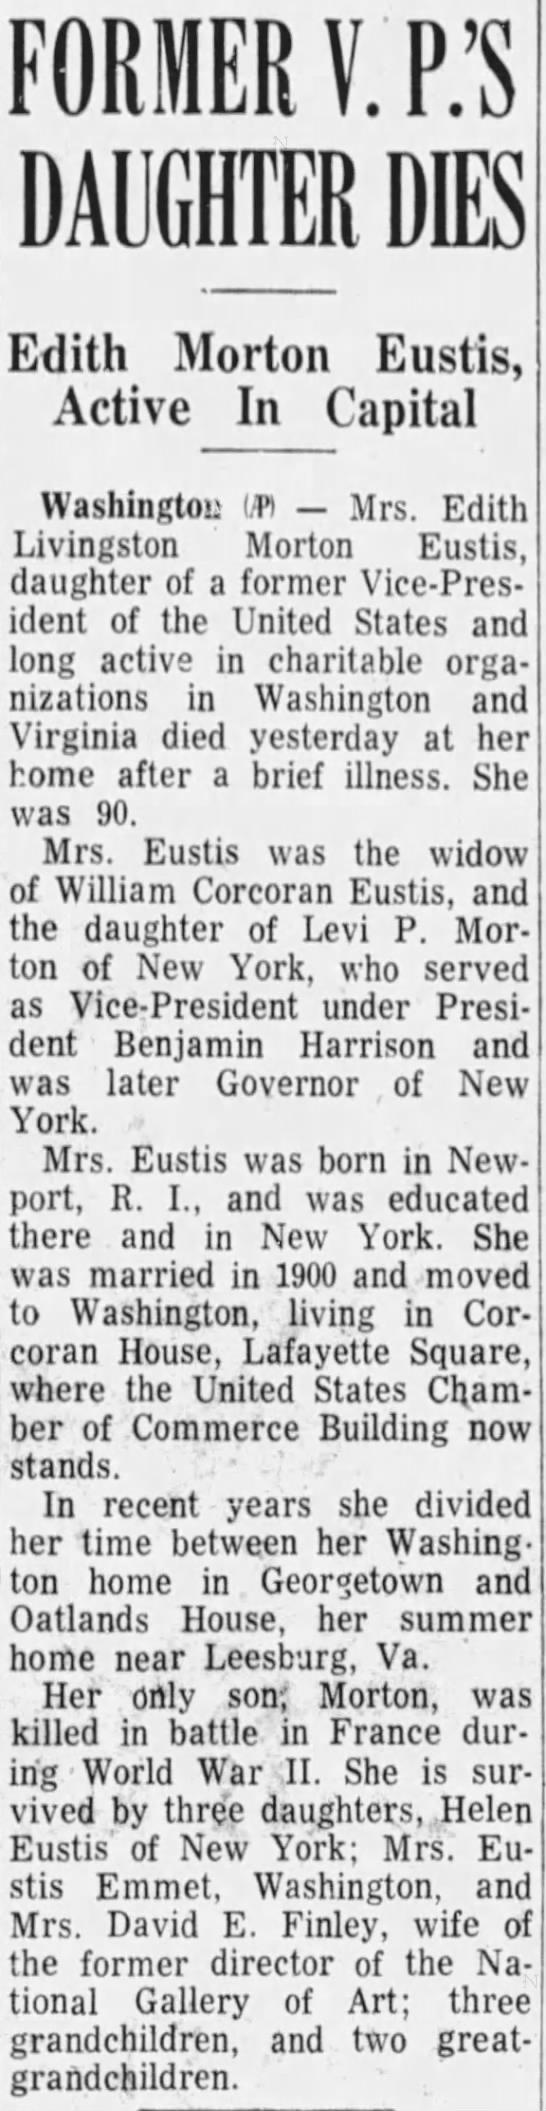 FORMER V.P.'S DAUGHTER DIES -- Edith Morton Eustis, Active in Capital -